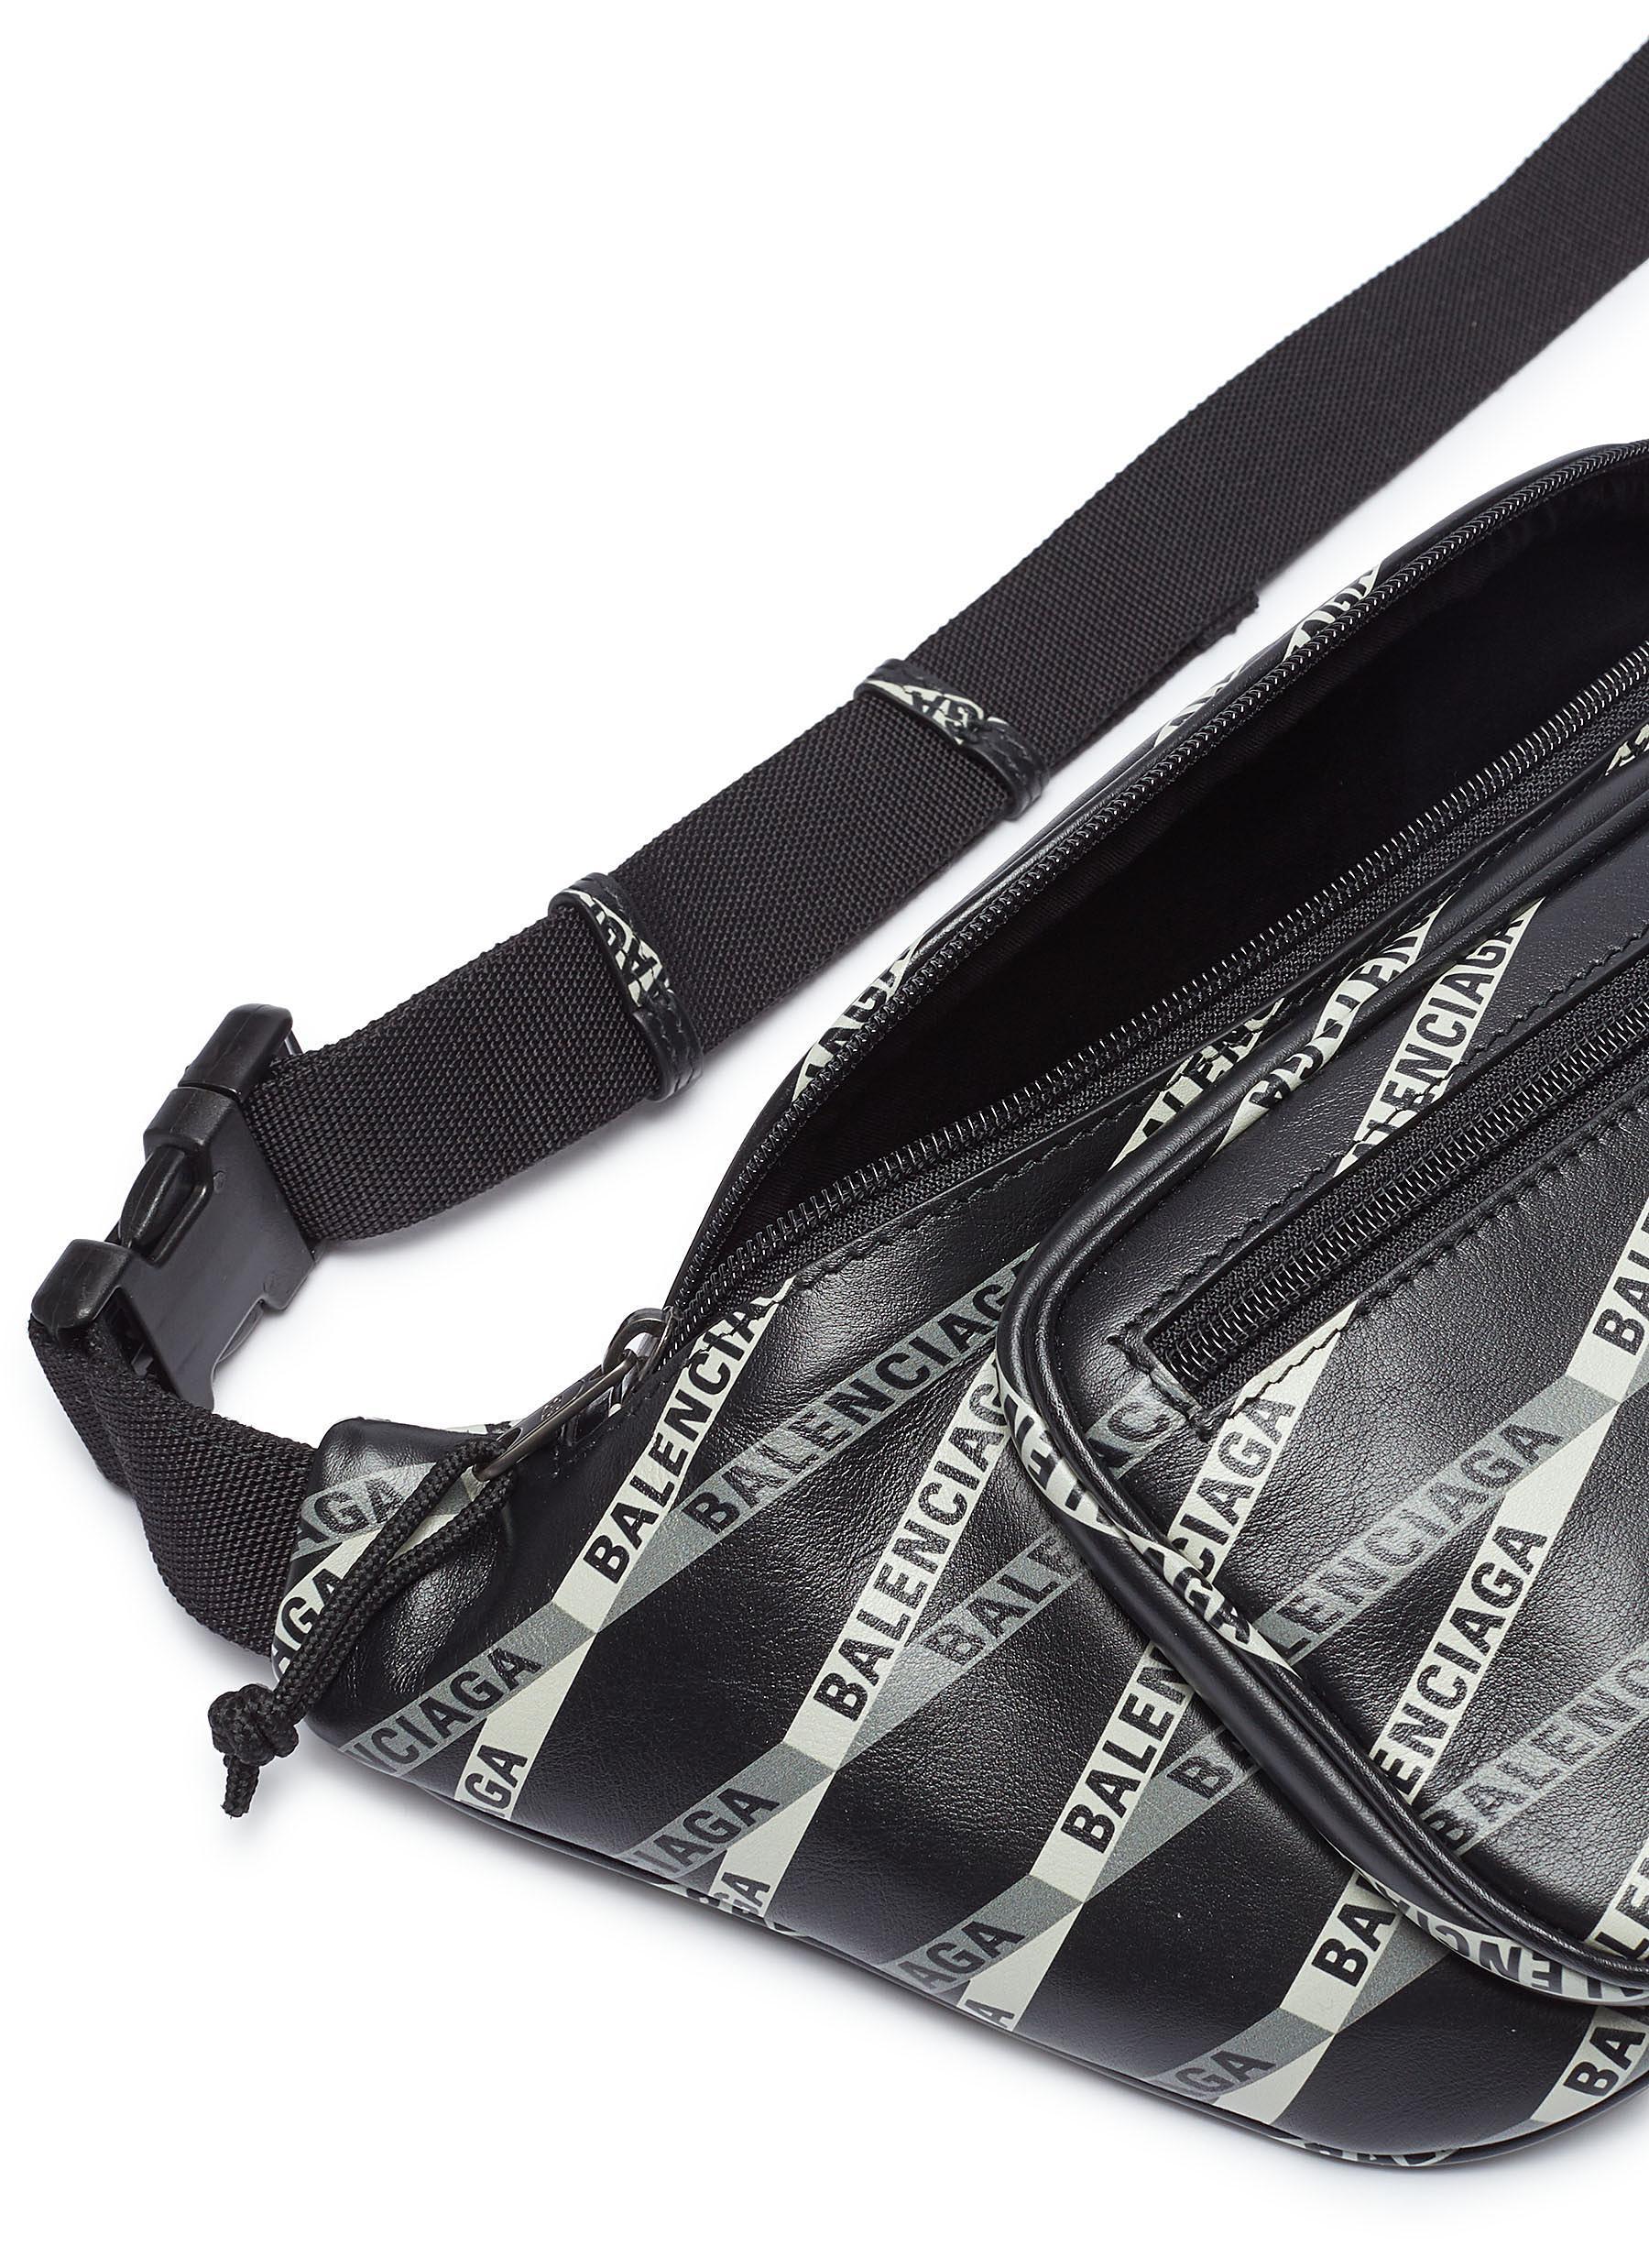 4b5749508c3 Balenciaga - Black 'explorer' Logo Tape Print Leather Belt Bag for Men -  Lyst. View fullscreen